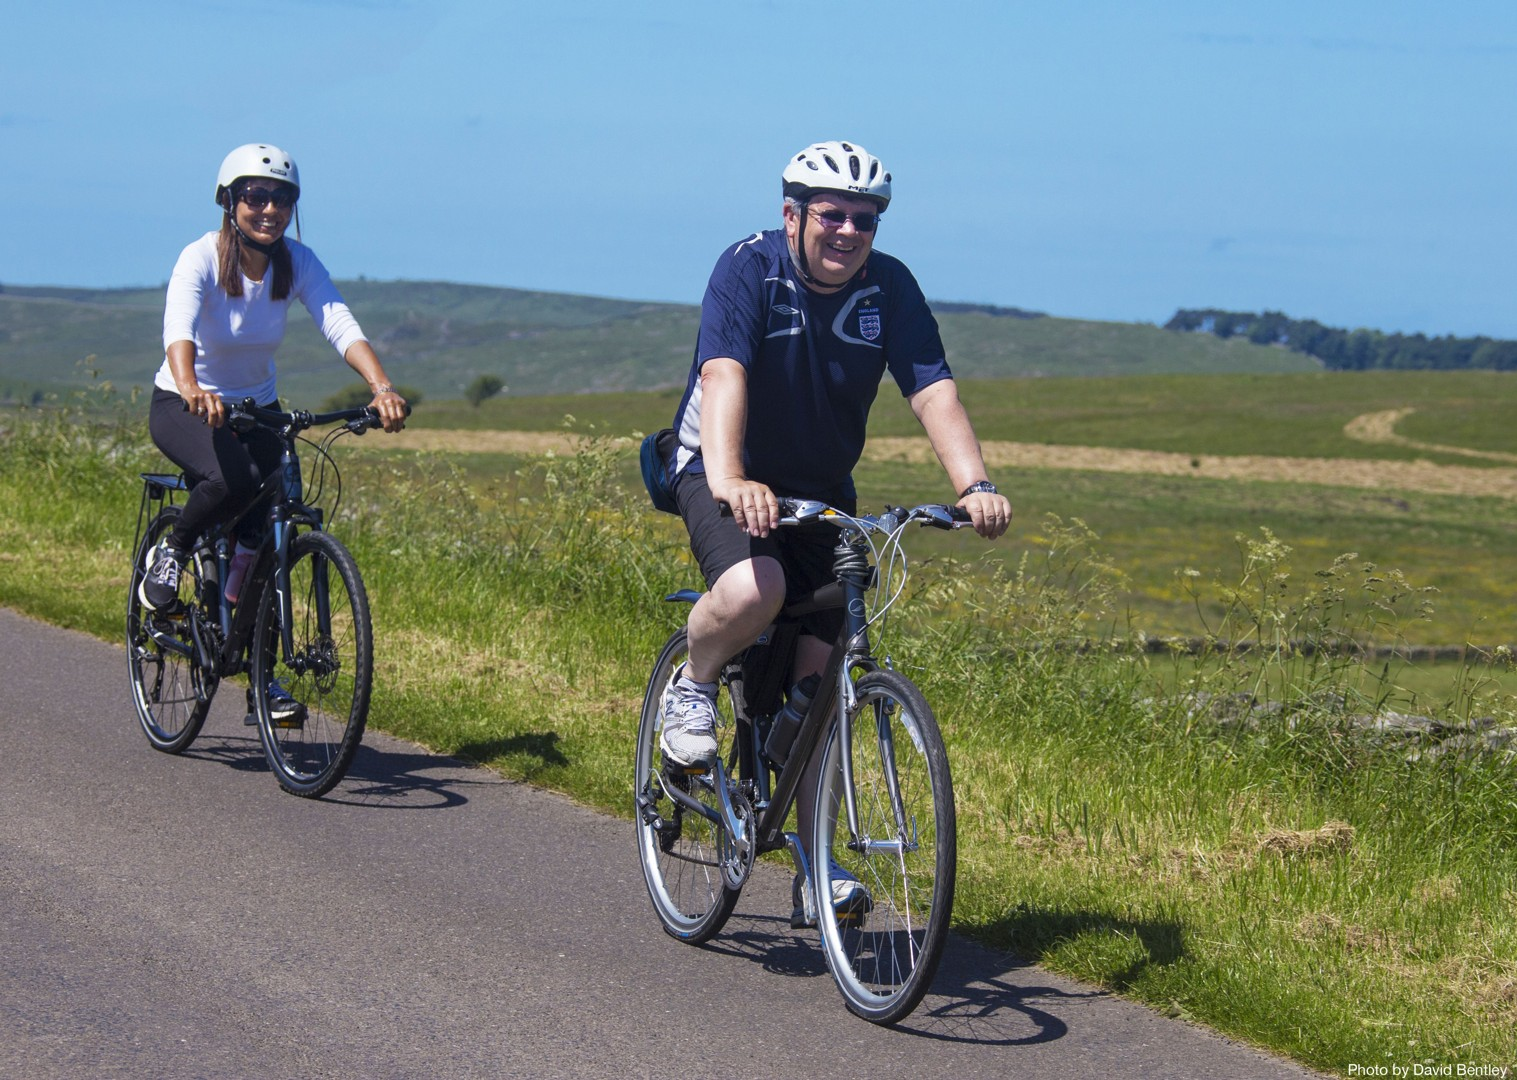 UK-Hadrians-Cycleway-Self-Guided-Leisure-Cycling-Holiday.jpg - UK - Hadrian's Cycleway - 4 Days Cycling - Self-Guided Leisure Cycling Holiday - Leisure Cycling